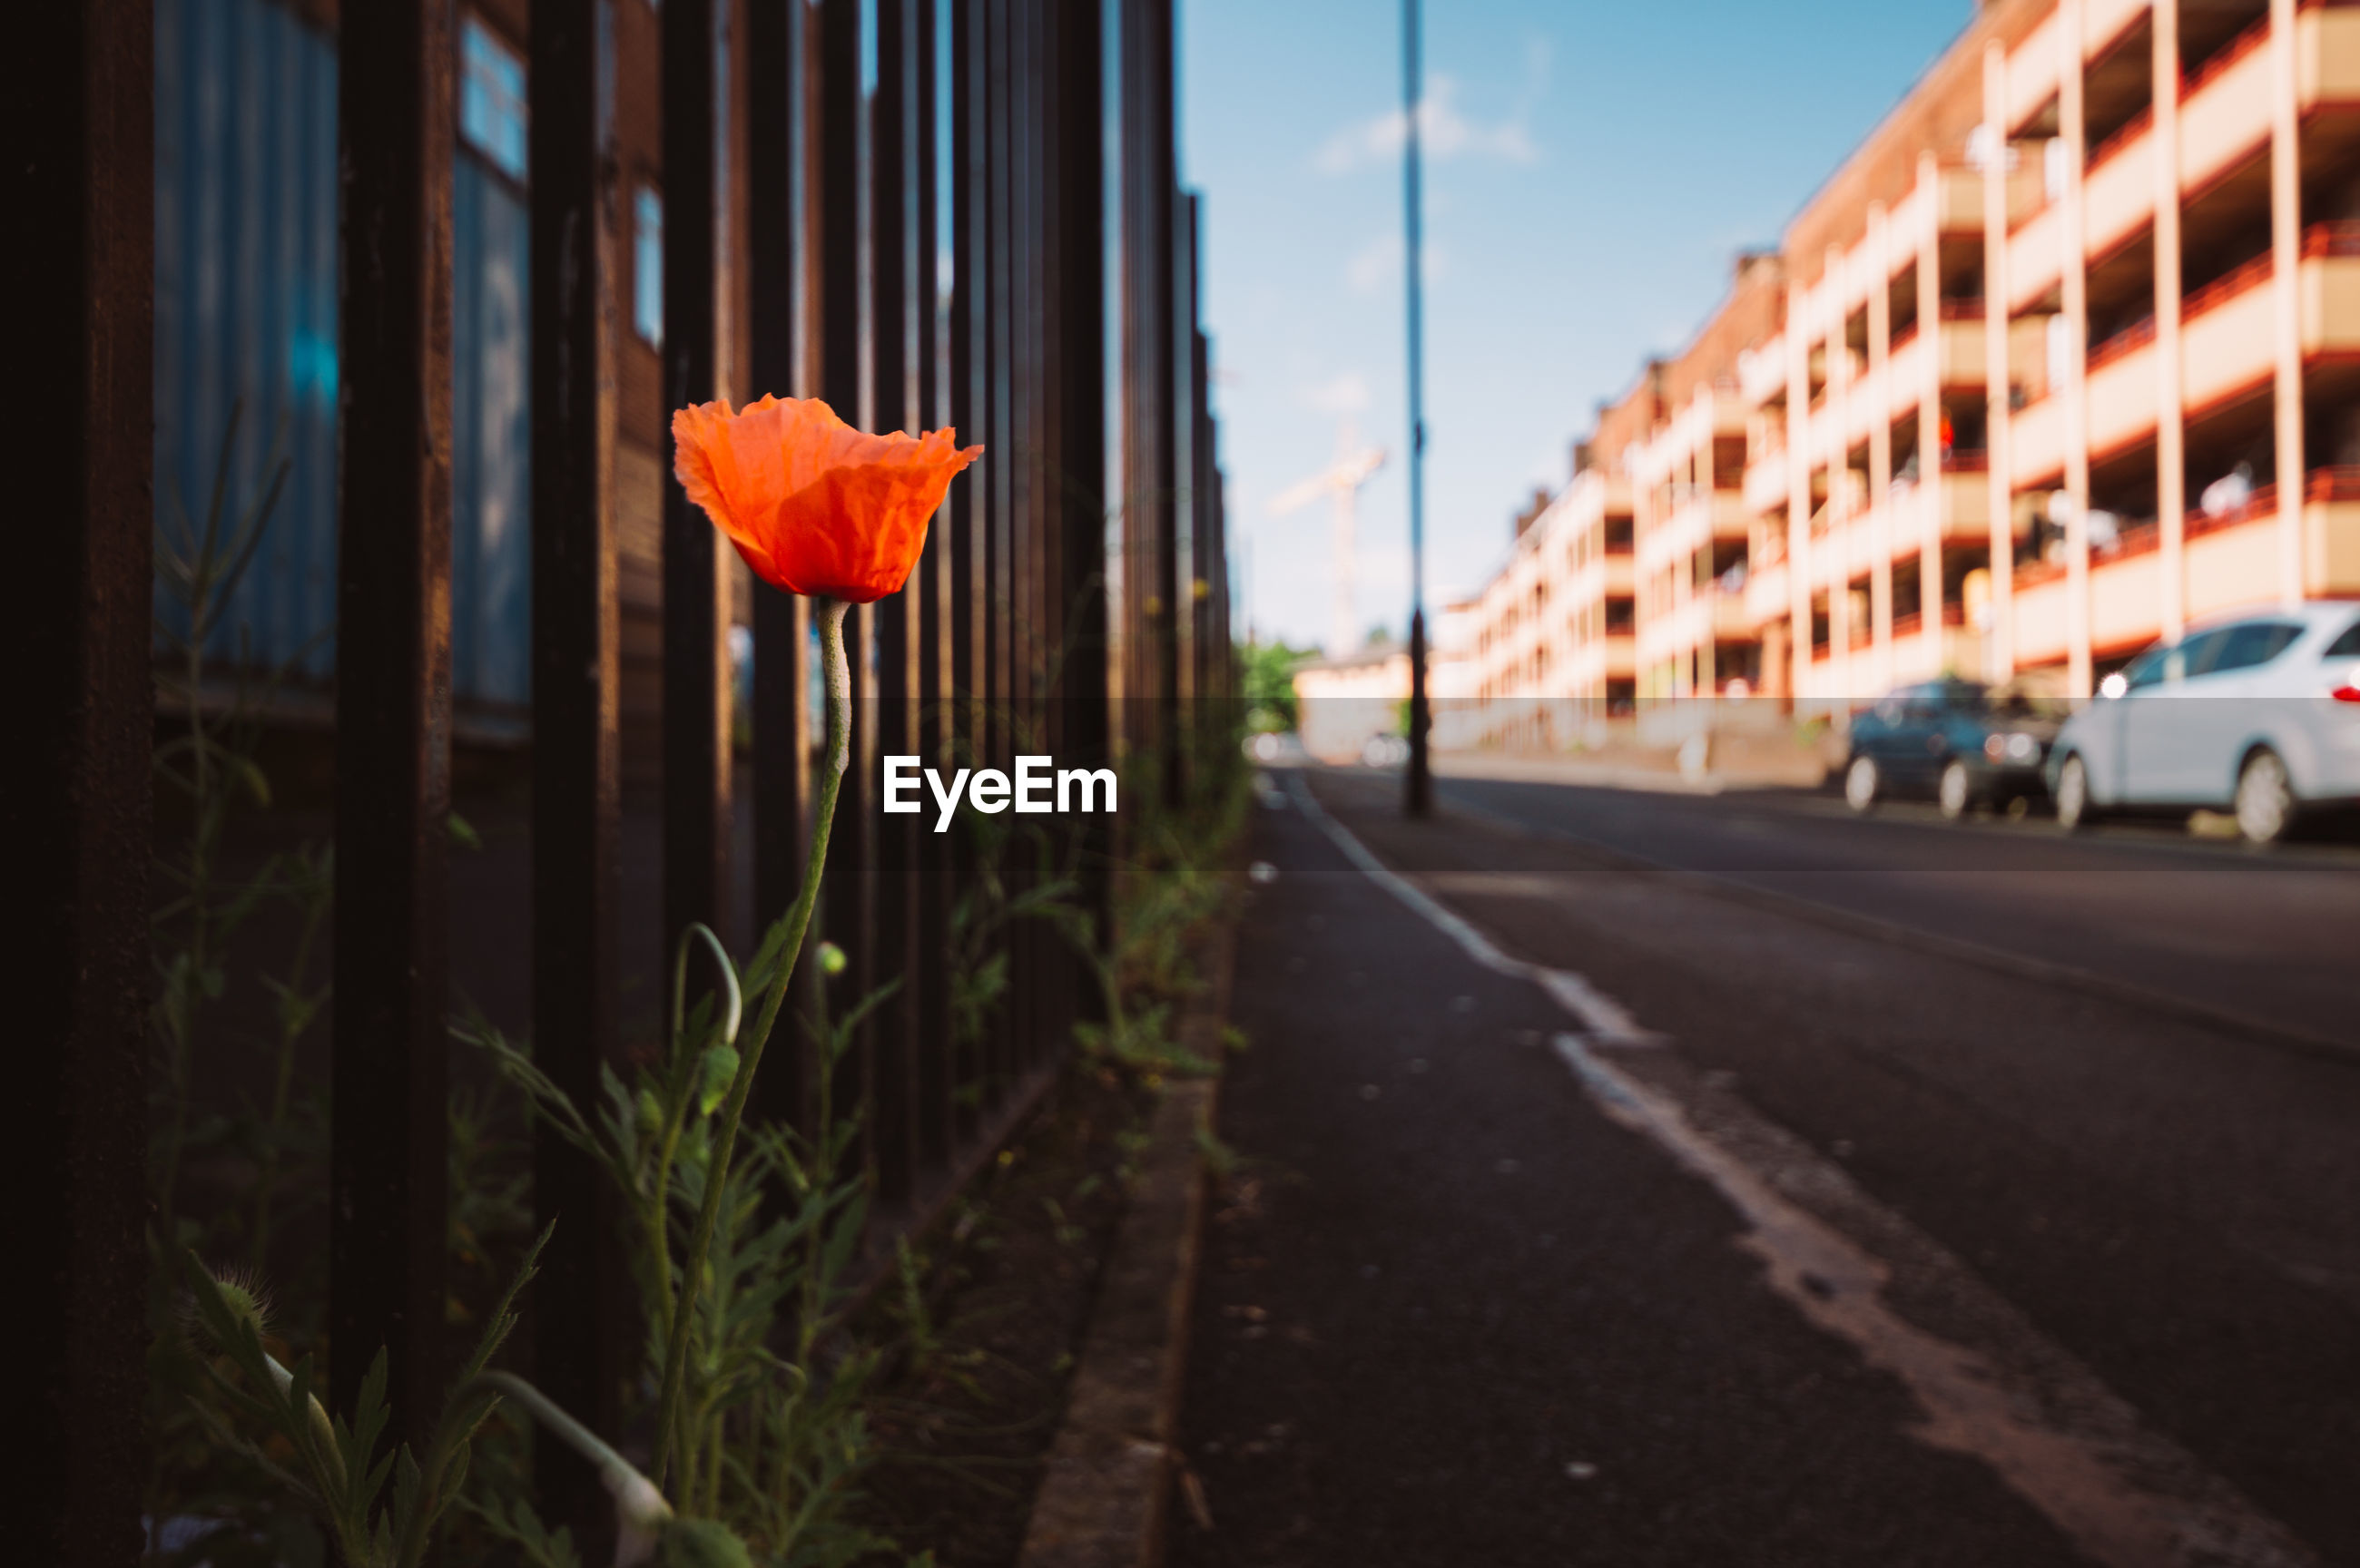 Flower by road against sky